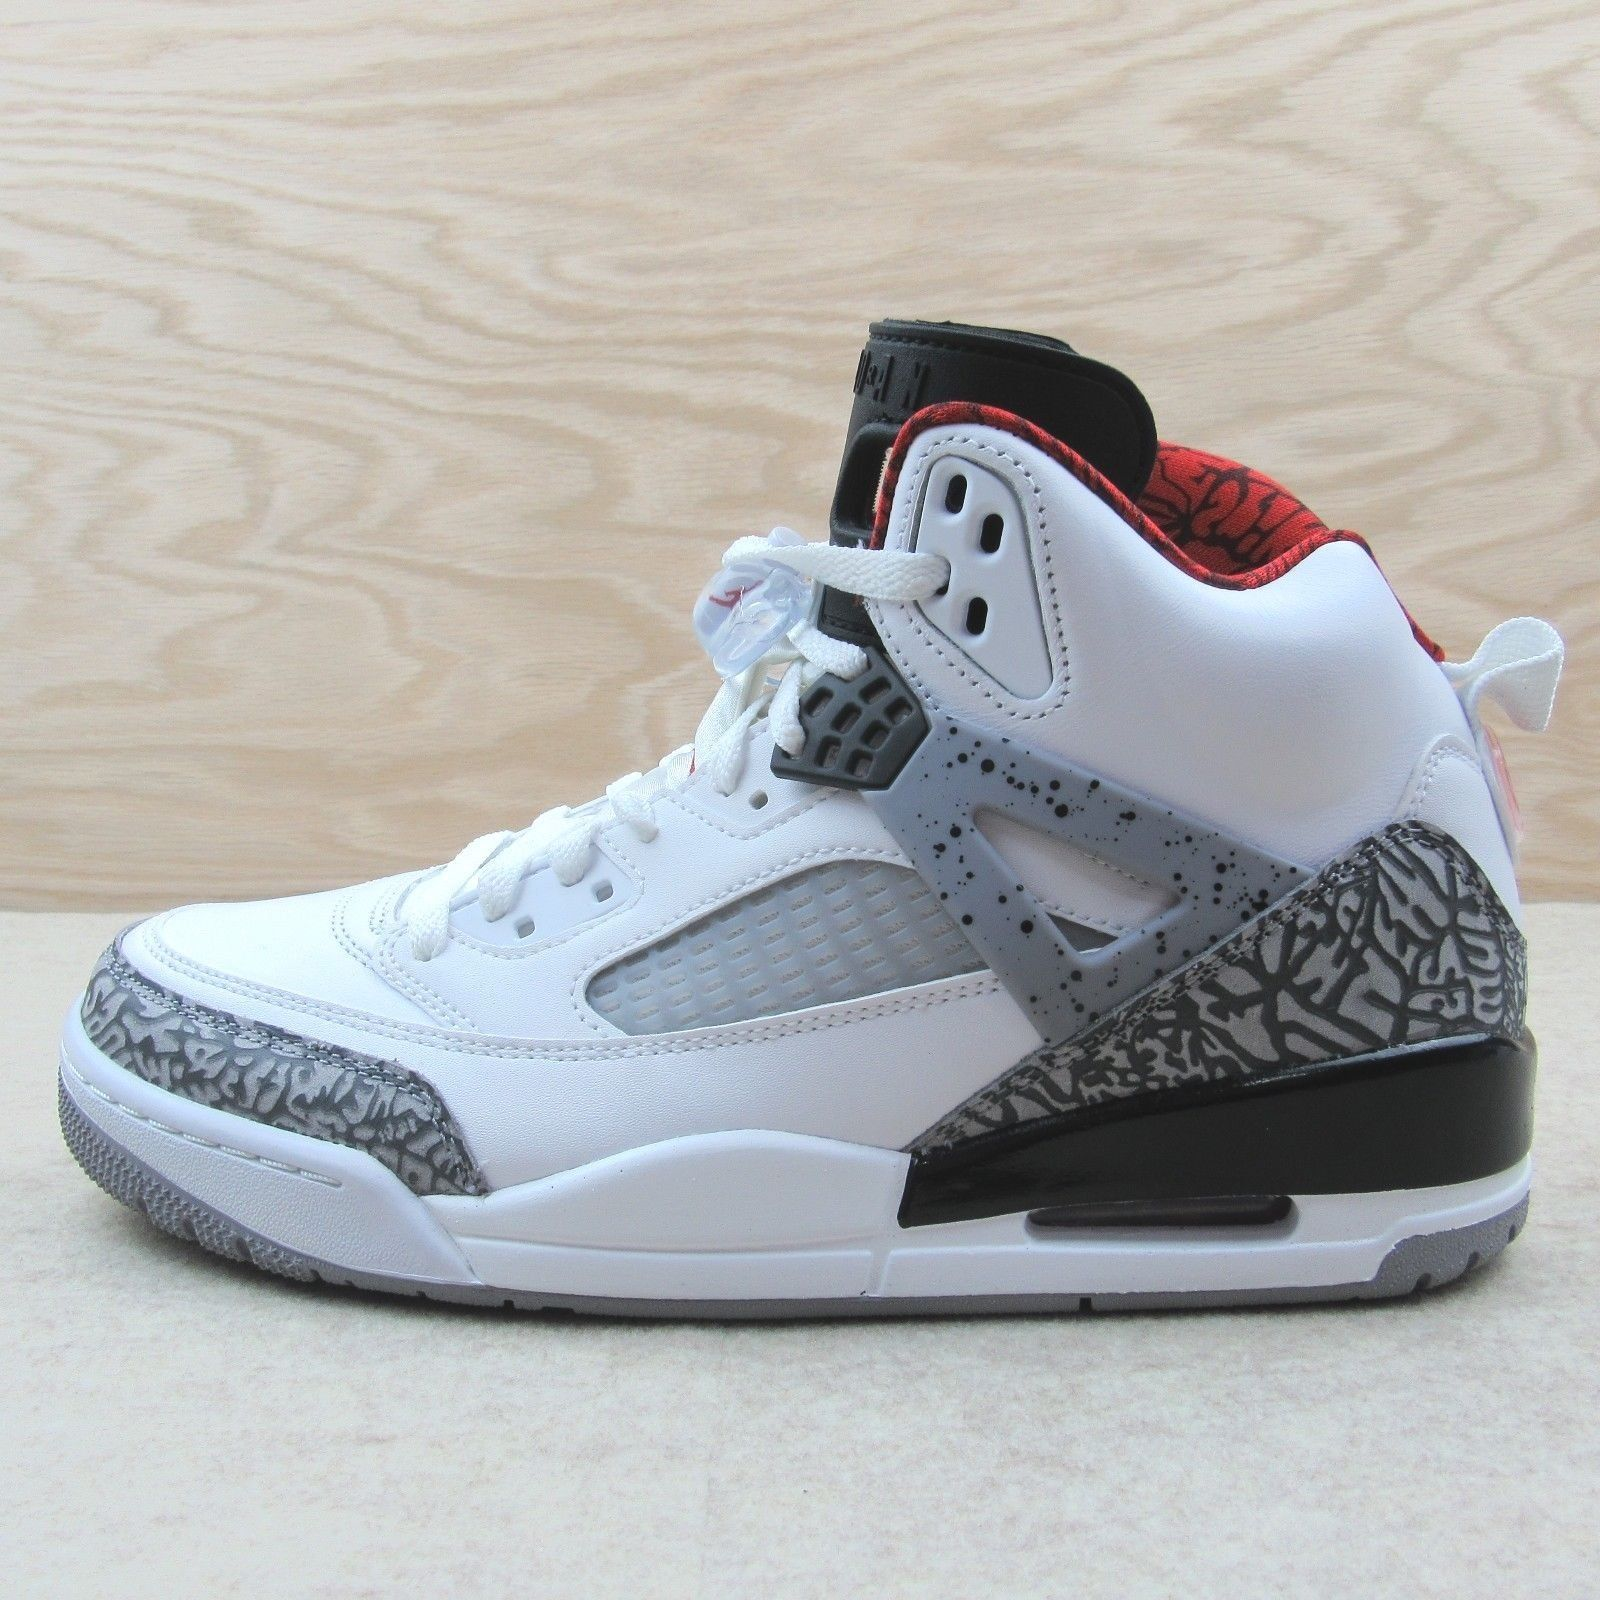 newest d2e46 7ac49 57. 57. Jordan Men s Spizike Size 9 Basketball Shoes 315371-122 White Cement  NEW